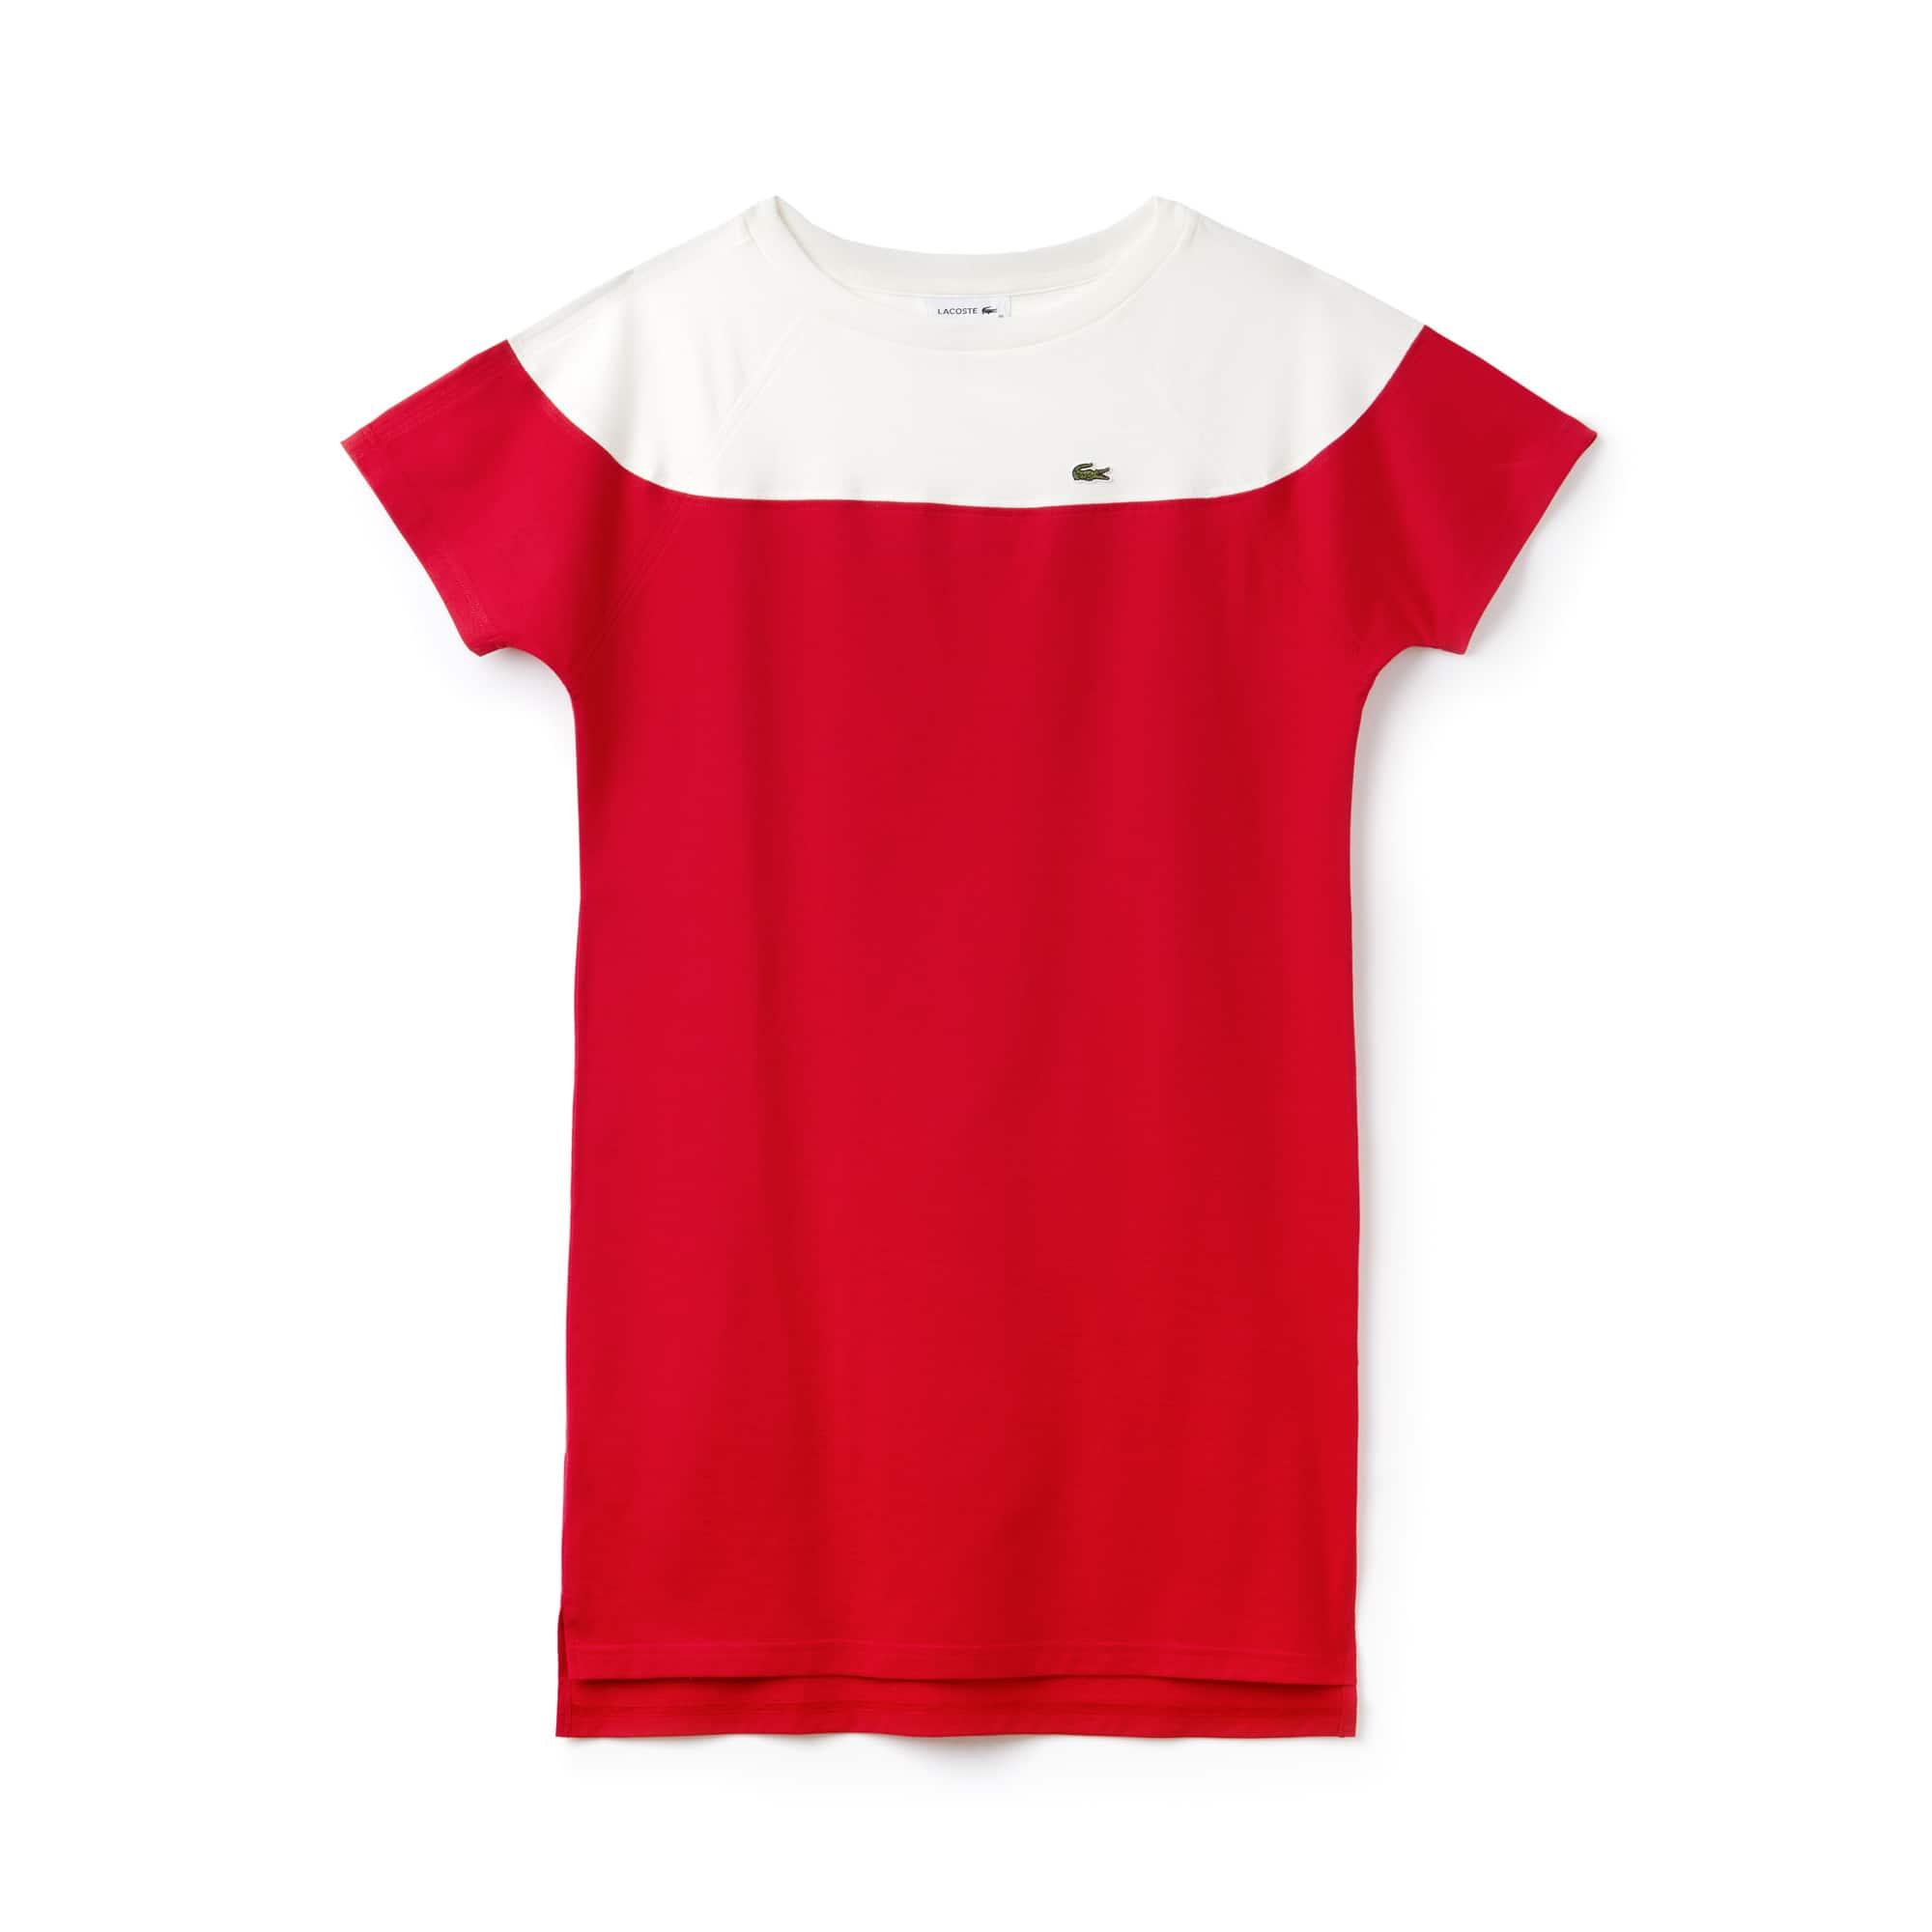 Women's Boat Neck Colorblock Cotton Jersey T-shirt Dress